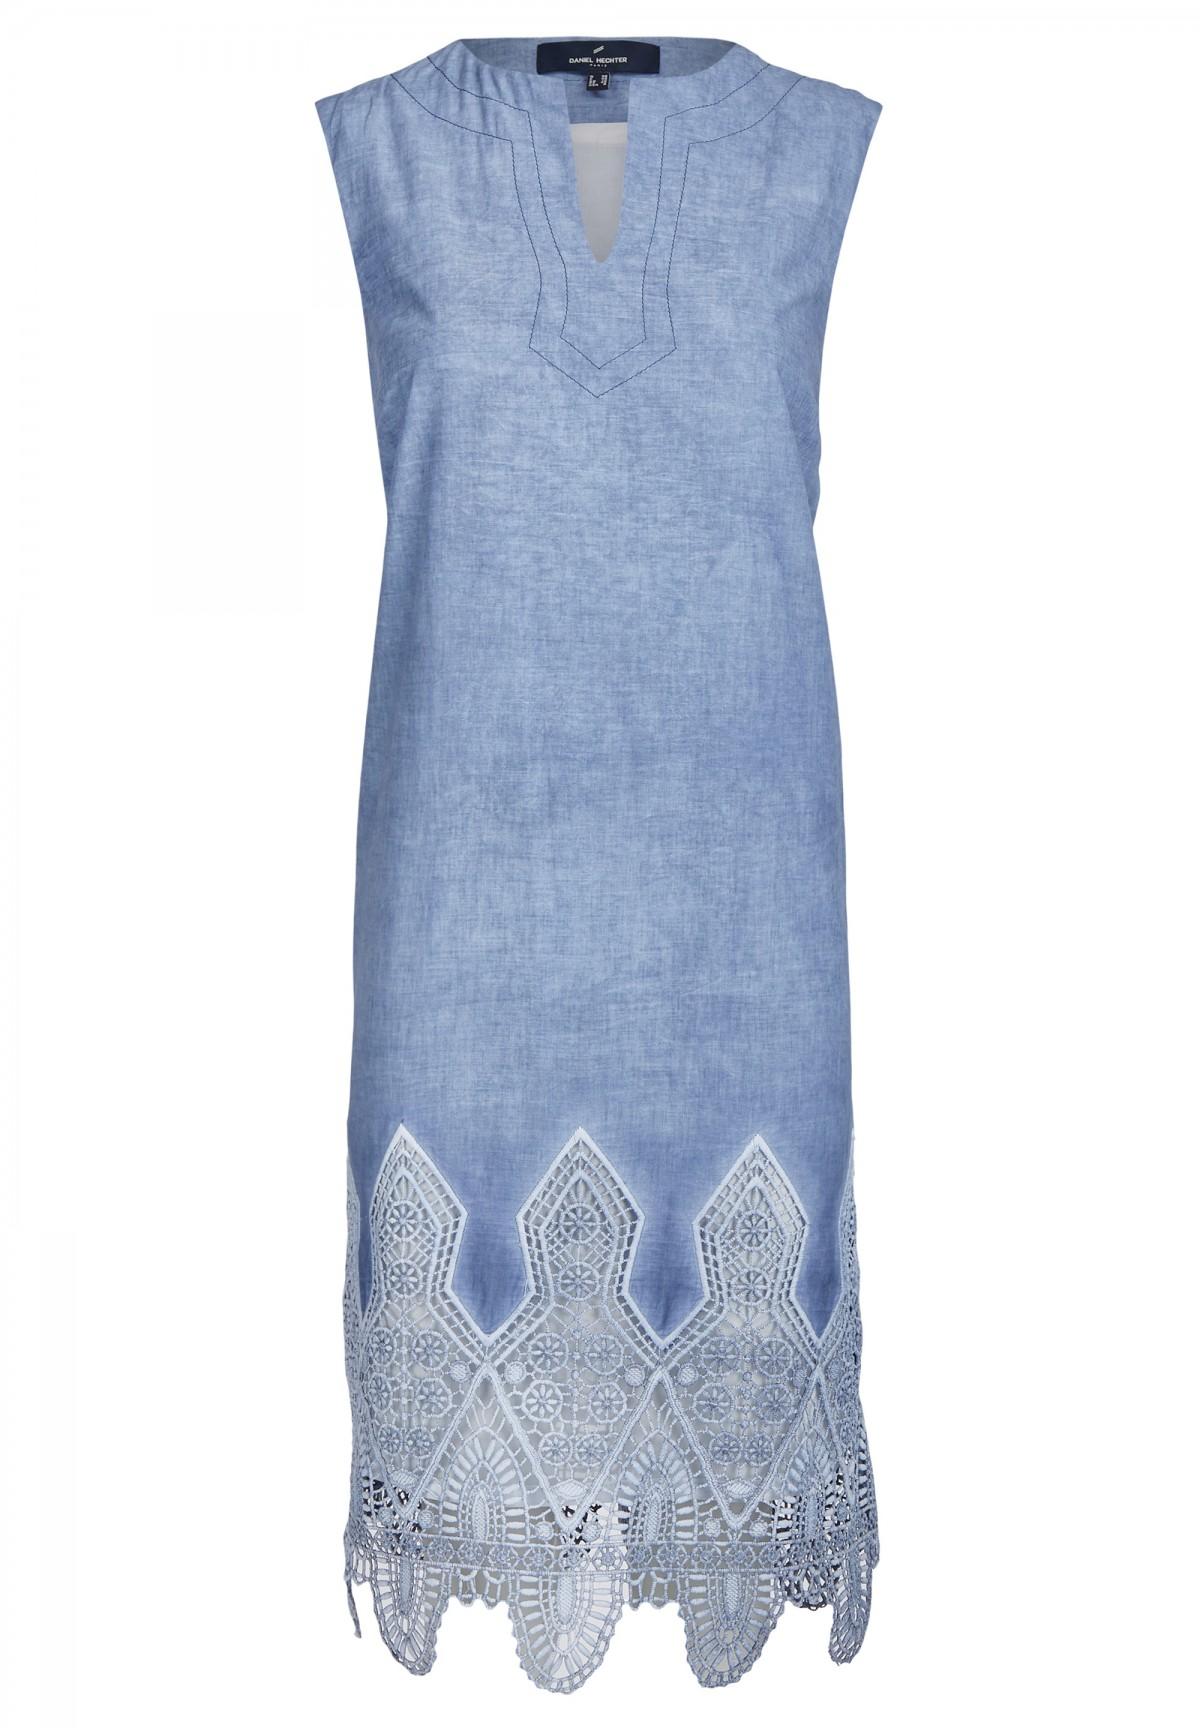 Süßes Kleid mit Spitze / Dress